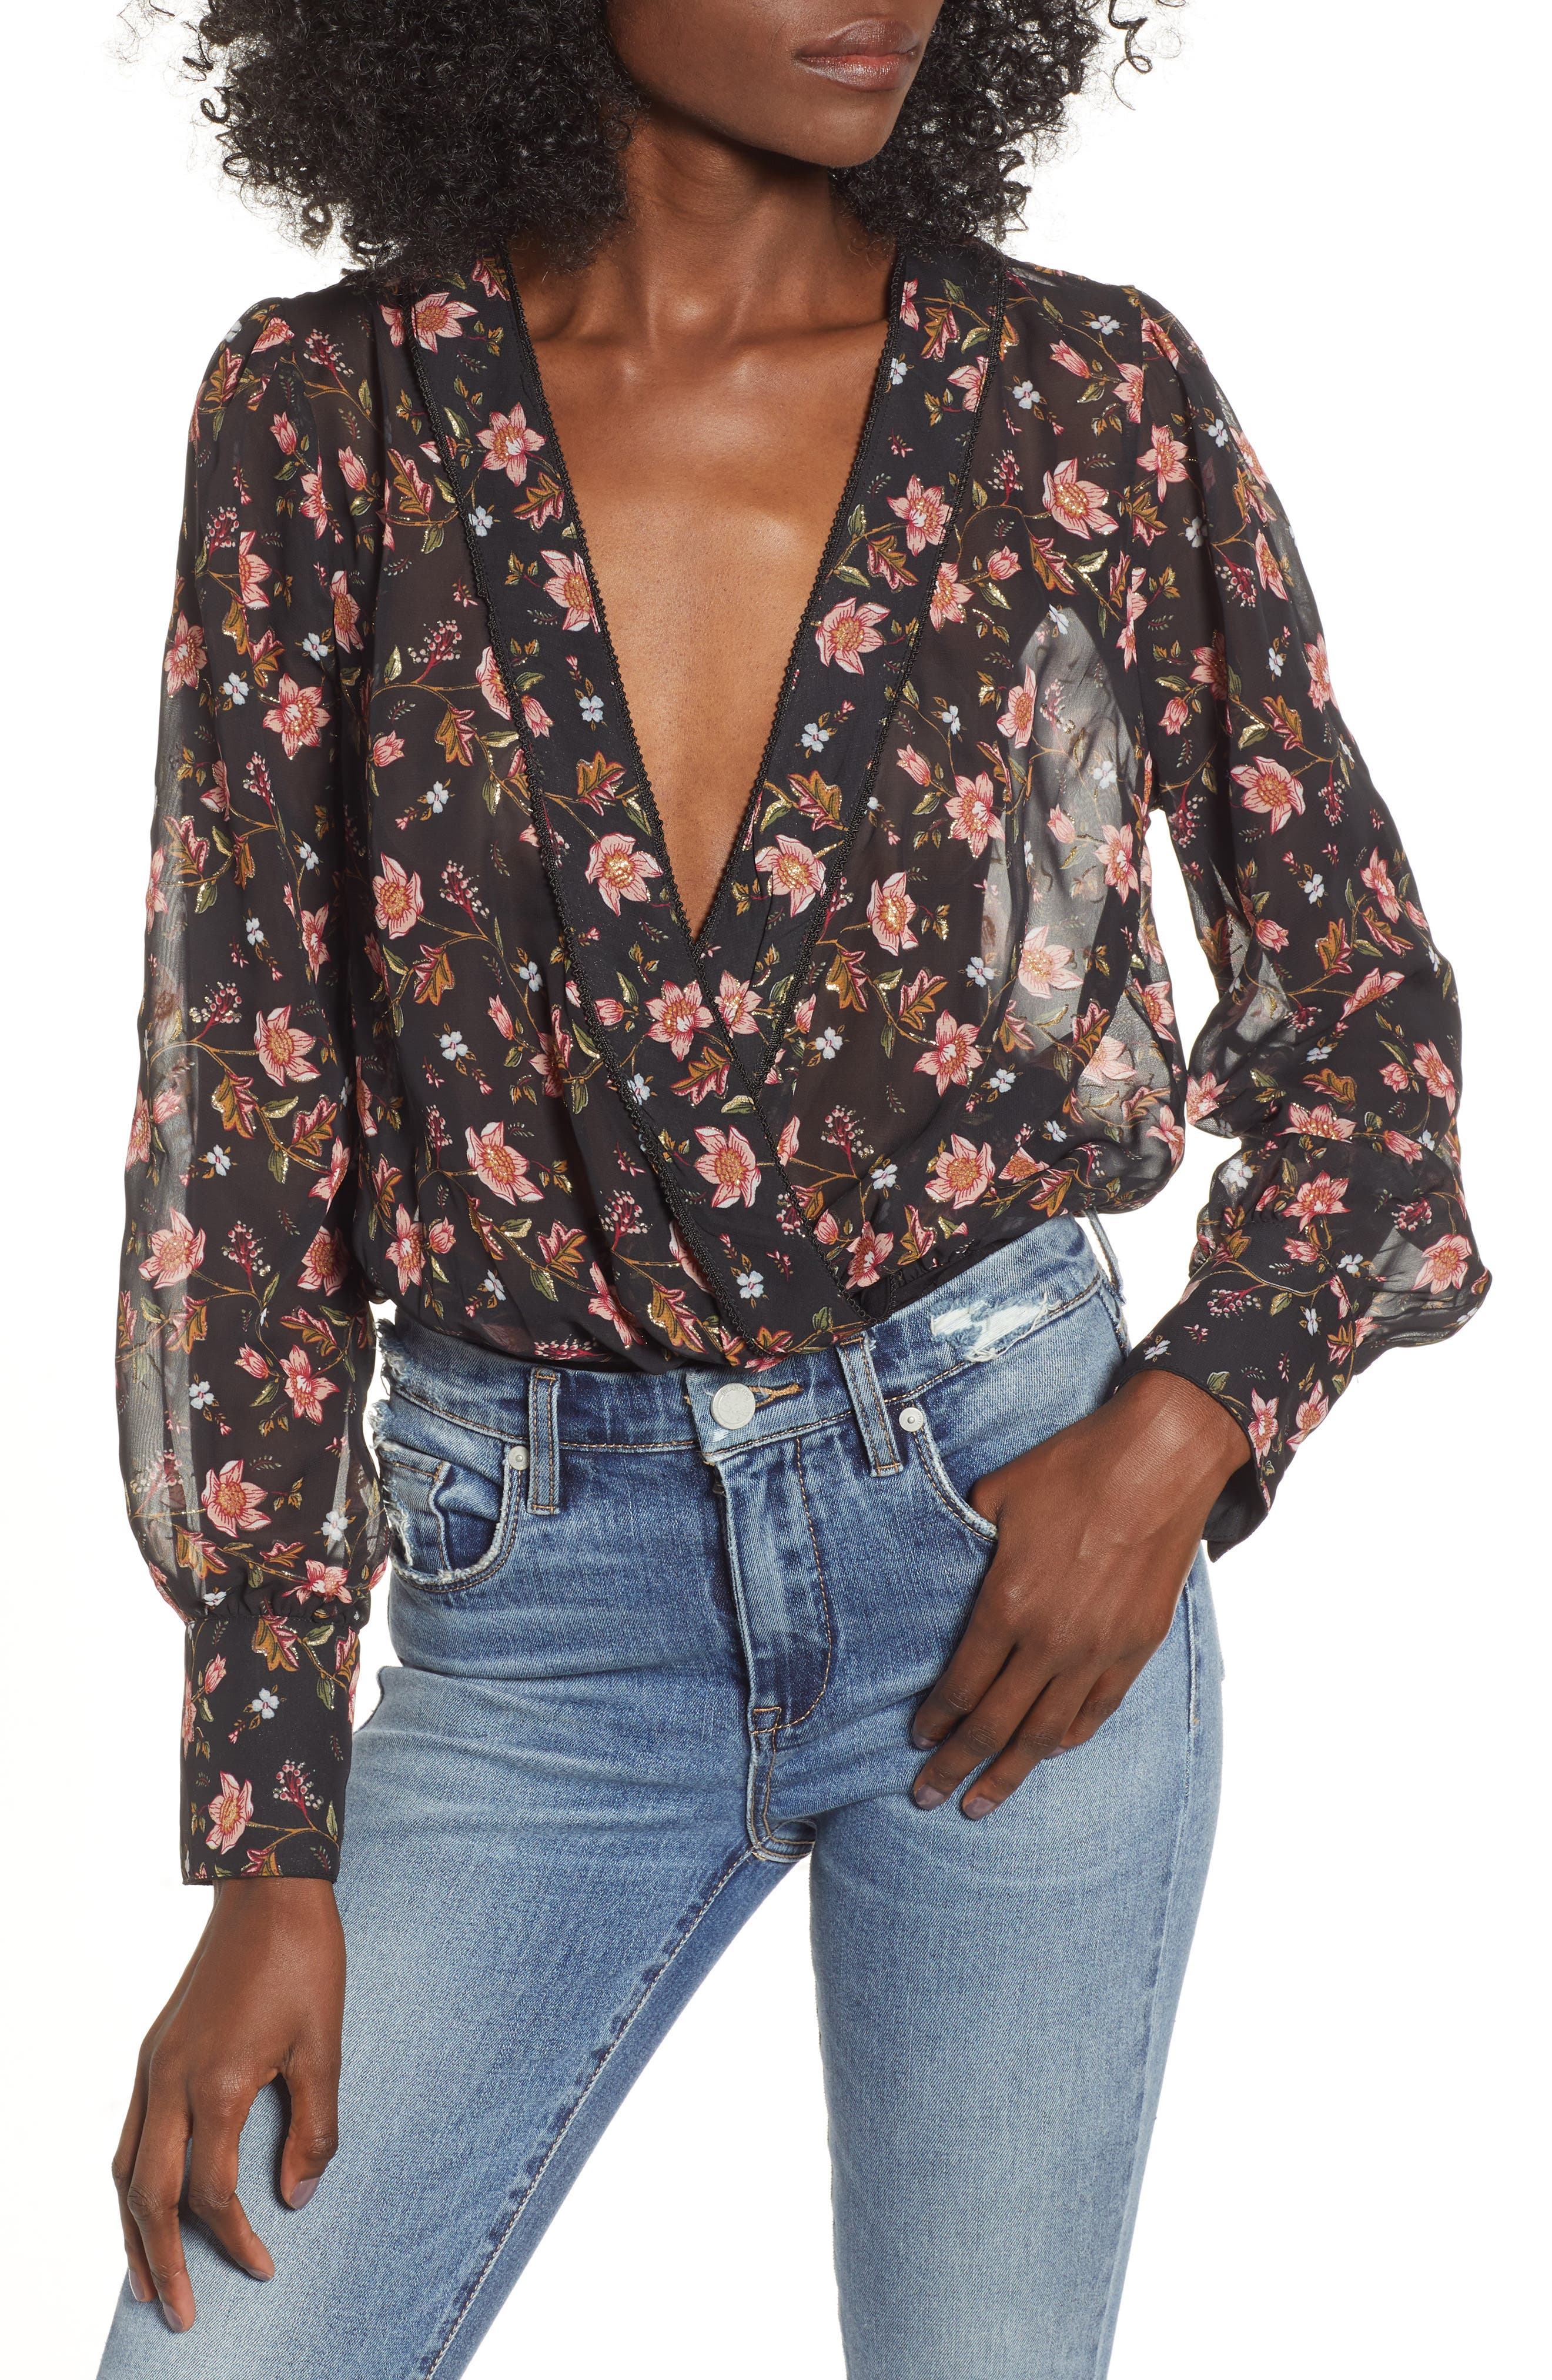 JOA Glitter Detail Floral Print Bodysuit in Metallic Floral